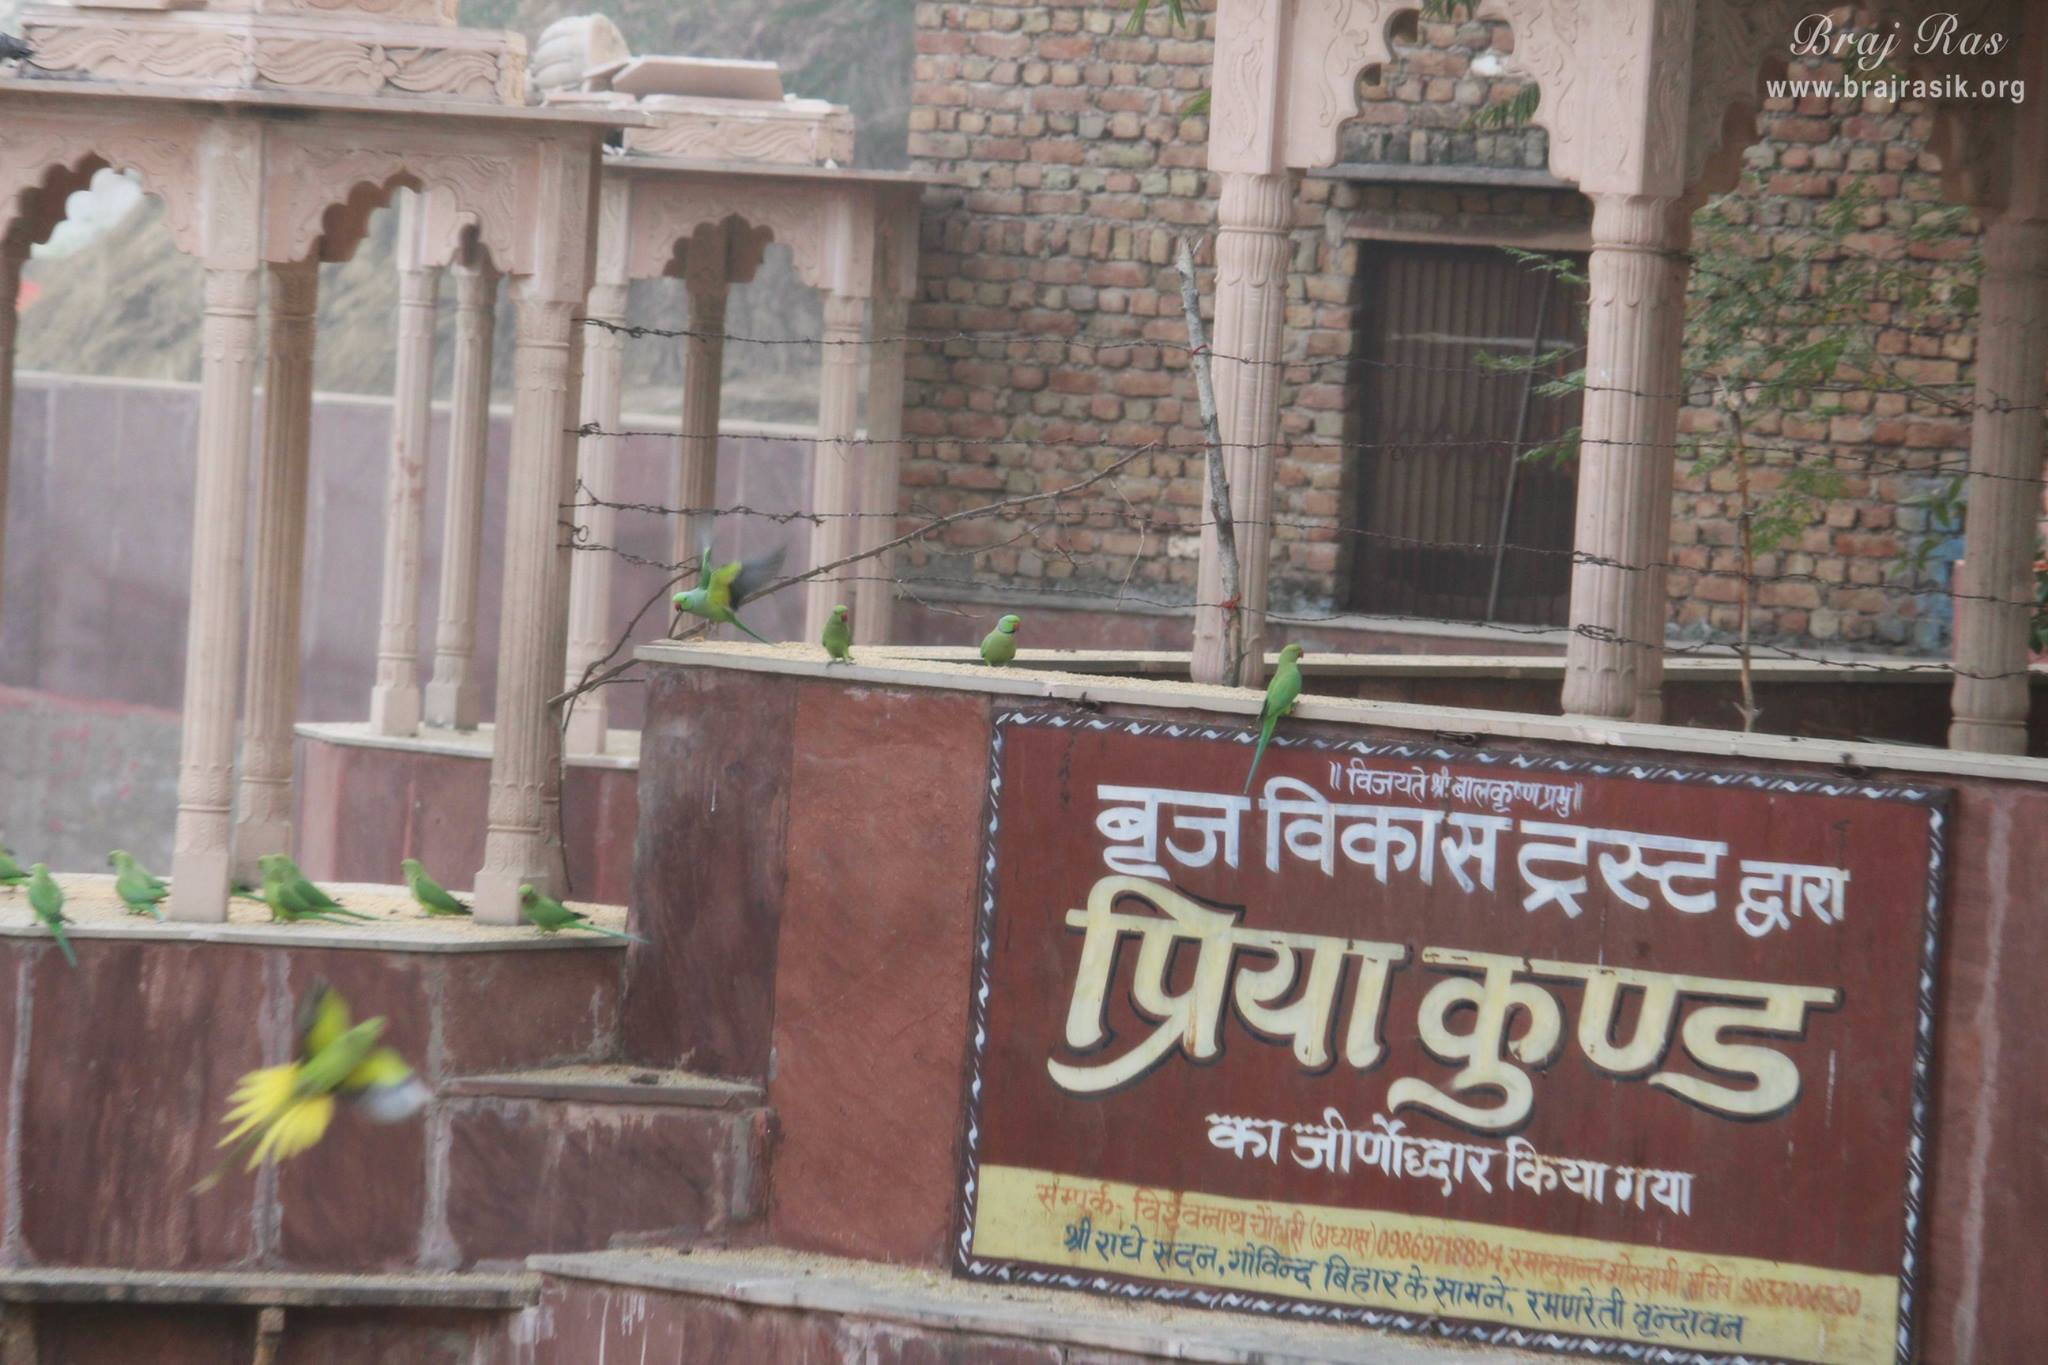 Priya Kunda (Peeli Pokhar), Barsana - Divine Pastimes